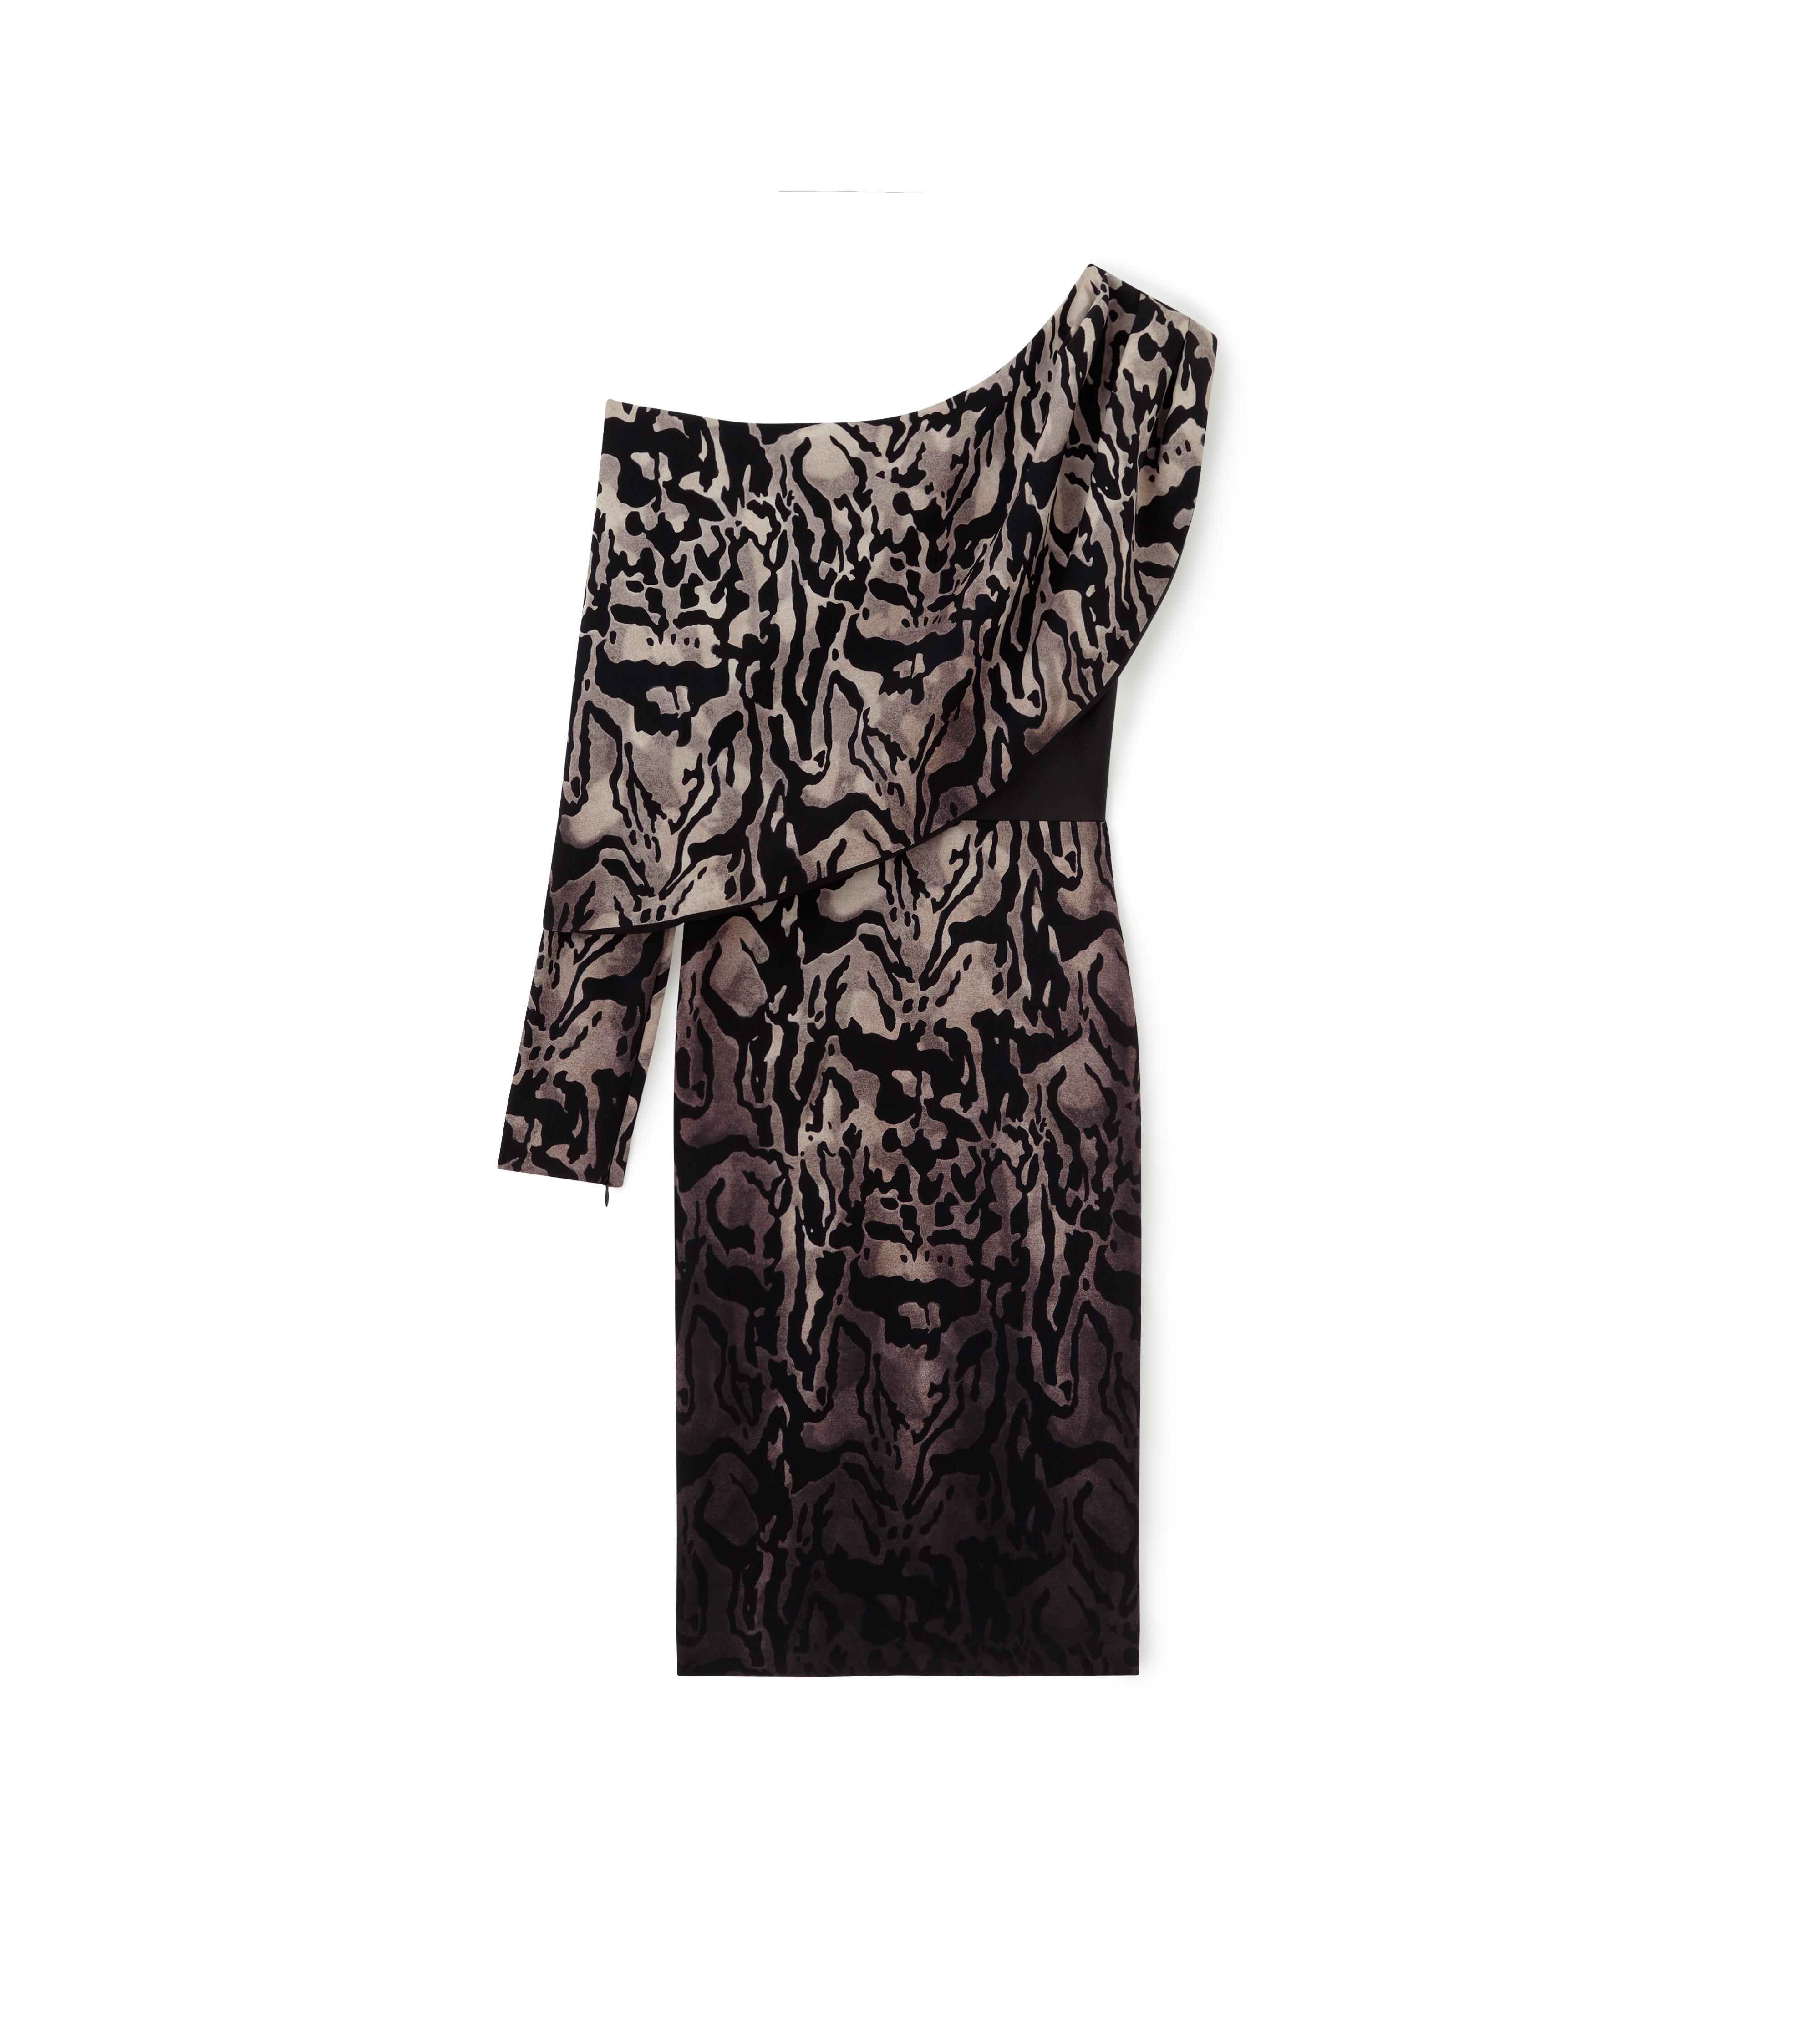 JAGUAR ASYMMETRICAL COCKTAIL DRESS WITH LEATHER CORSET A thumbnail